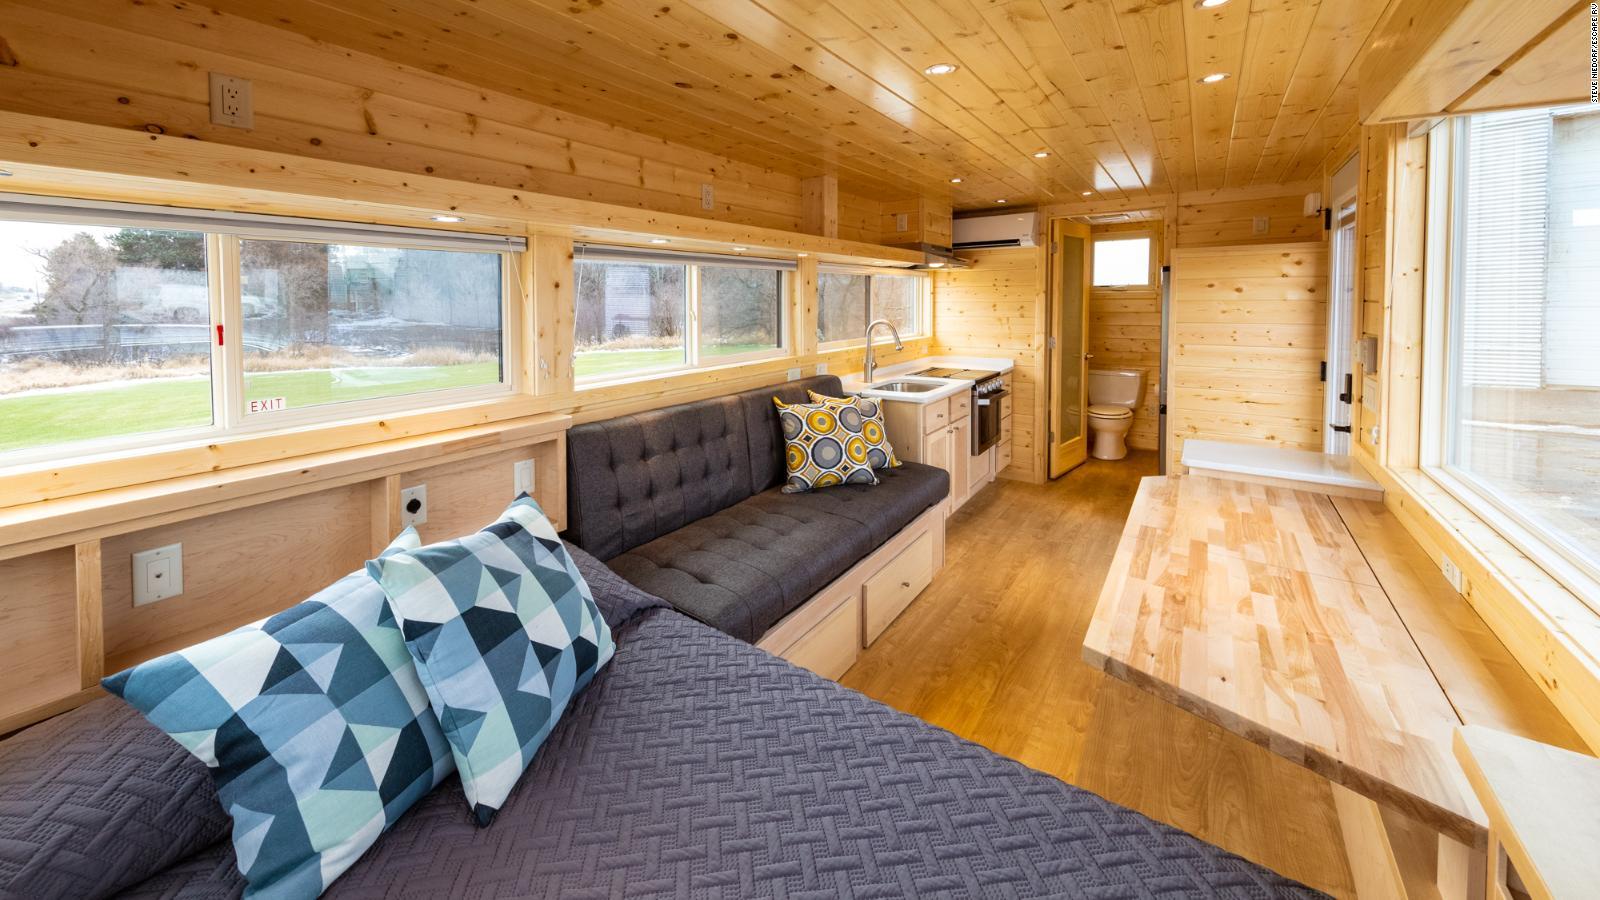 Design Homes Pr Wi Html on design homes missouri, design homes mo, design homes oregon, design homes nebraska, design homes in mn,